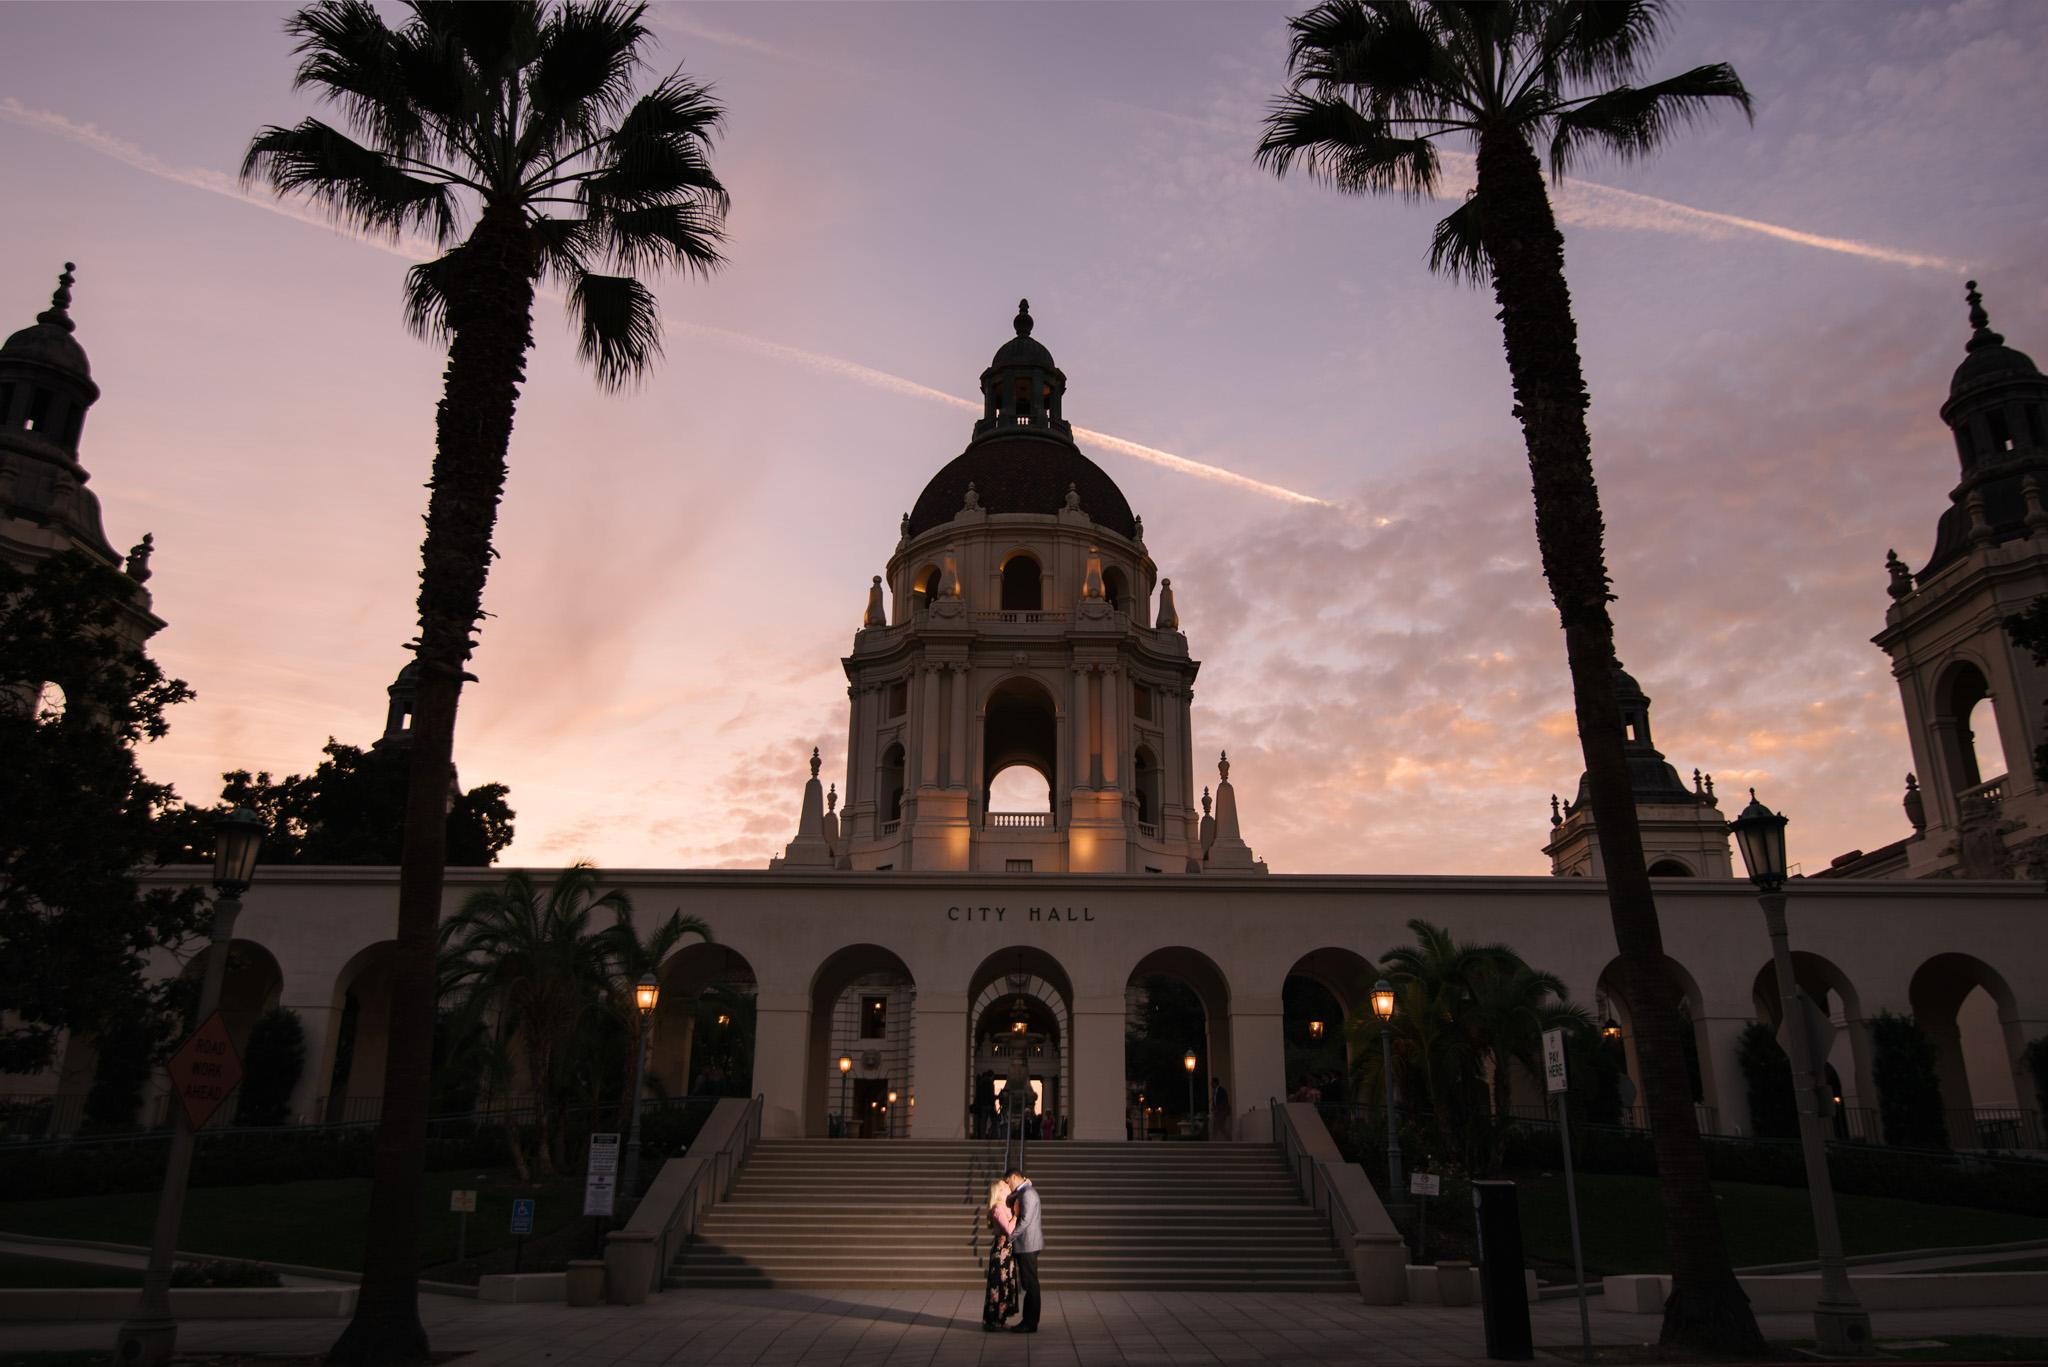 0014-JM-Pasadena-City-Hall-Los-Angeles-County-Engagement-Photography